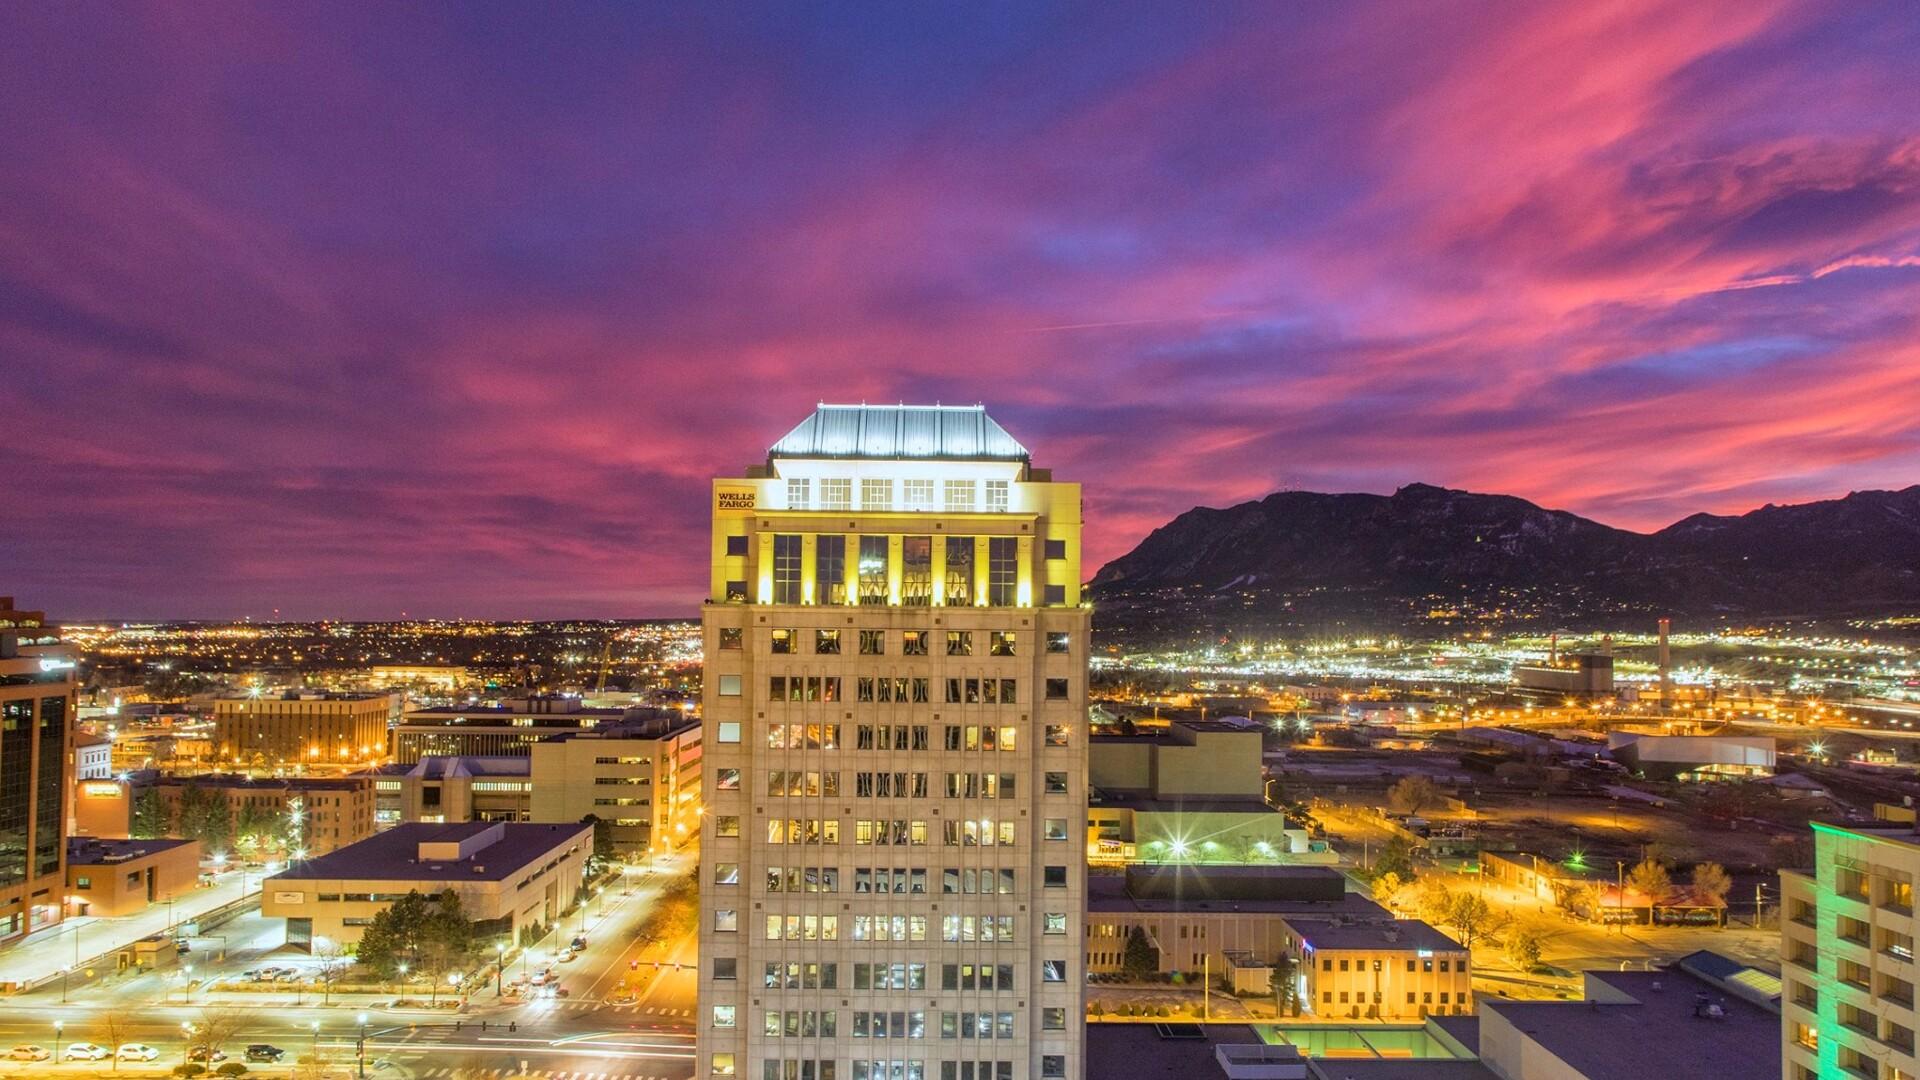 Joe Randall Colorado Springs.jpg